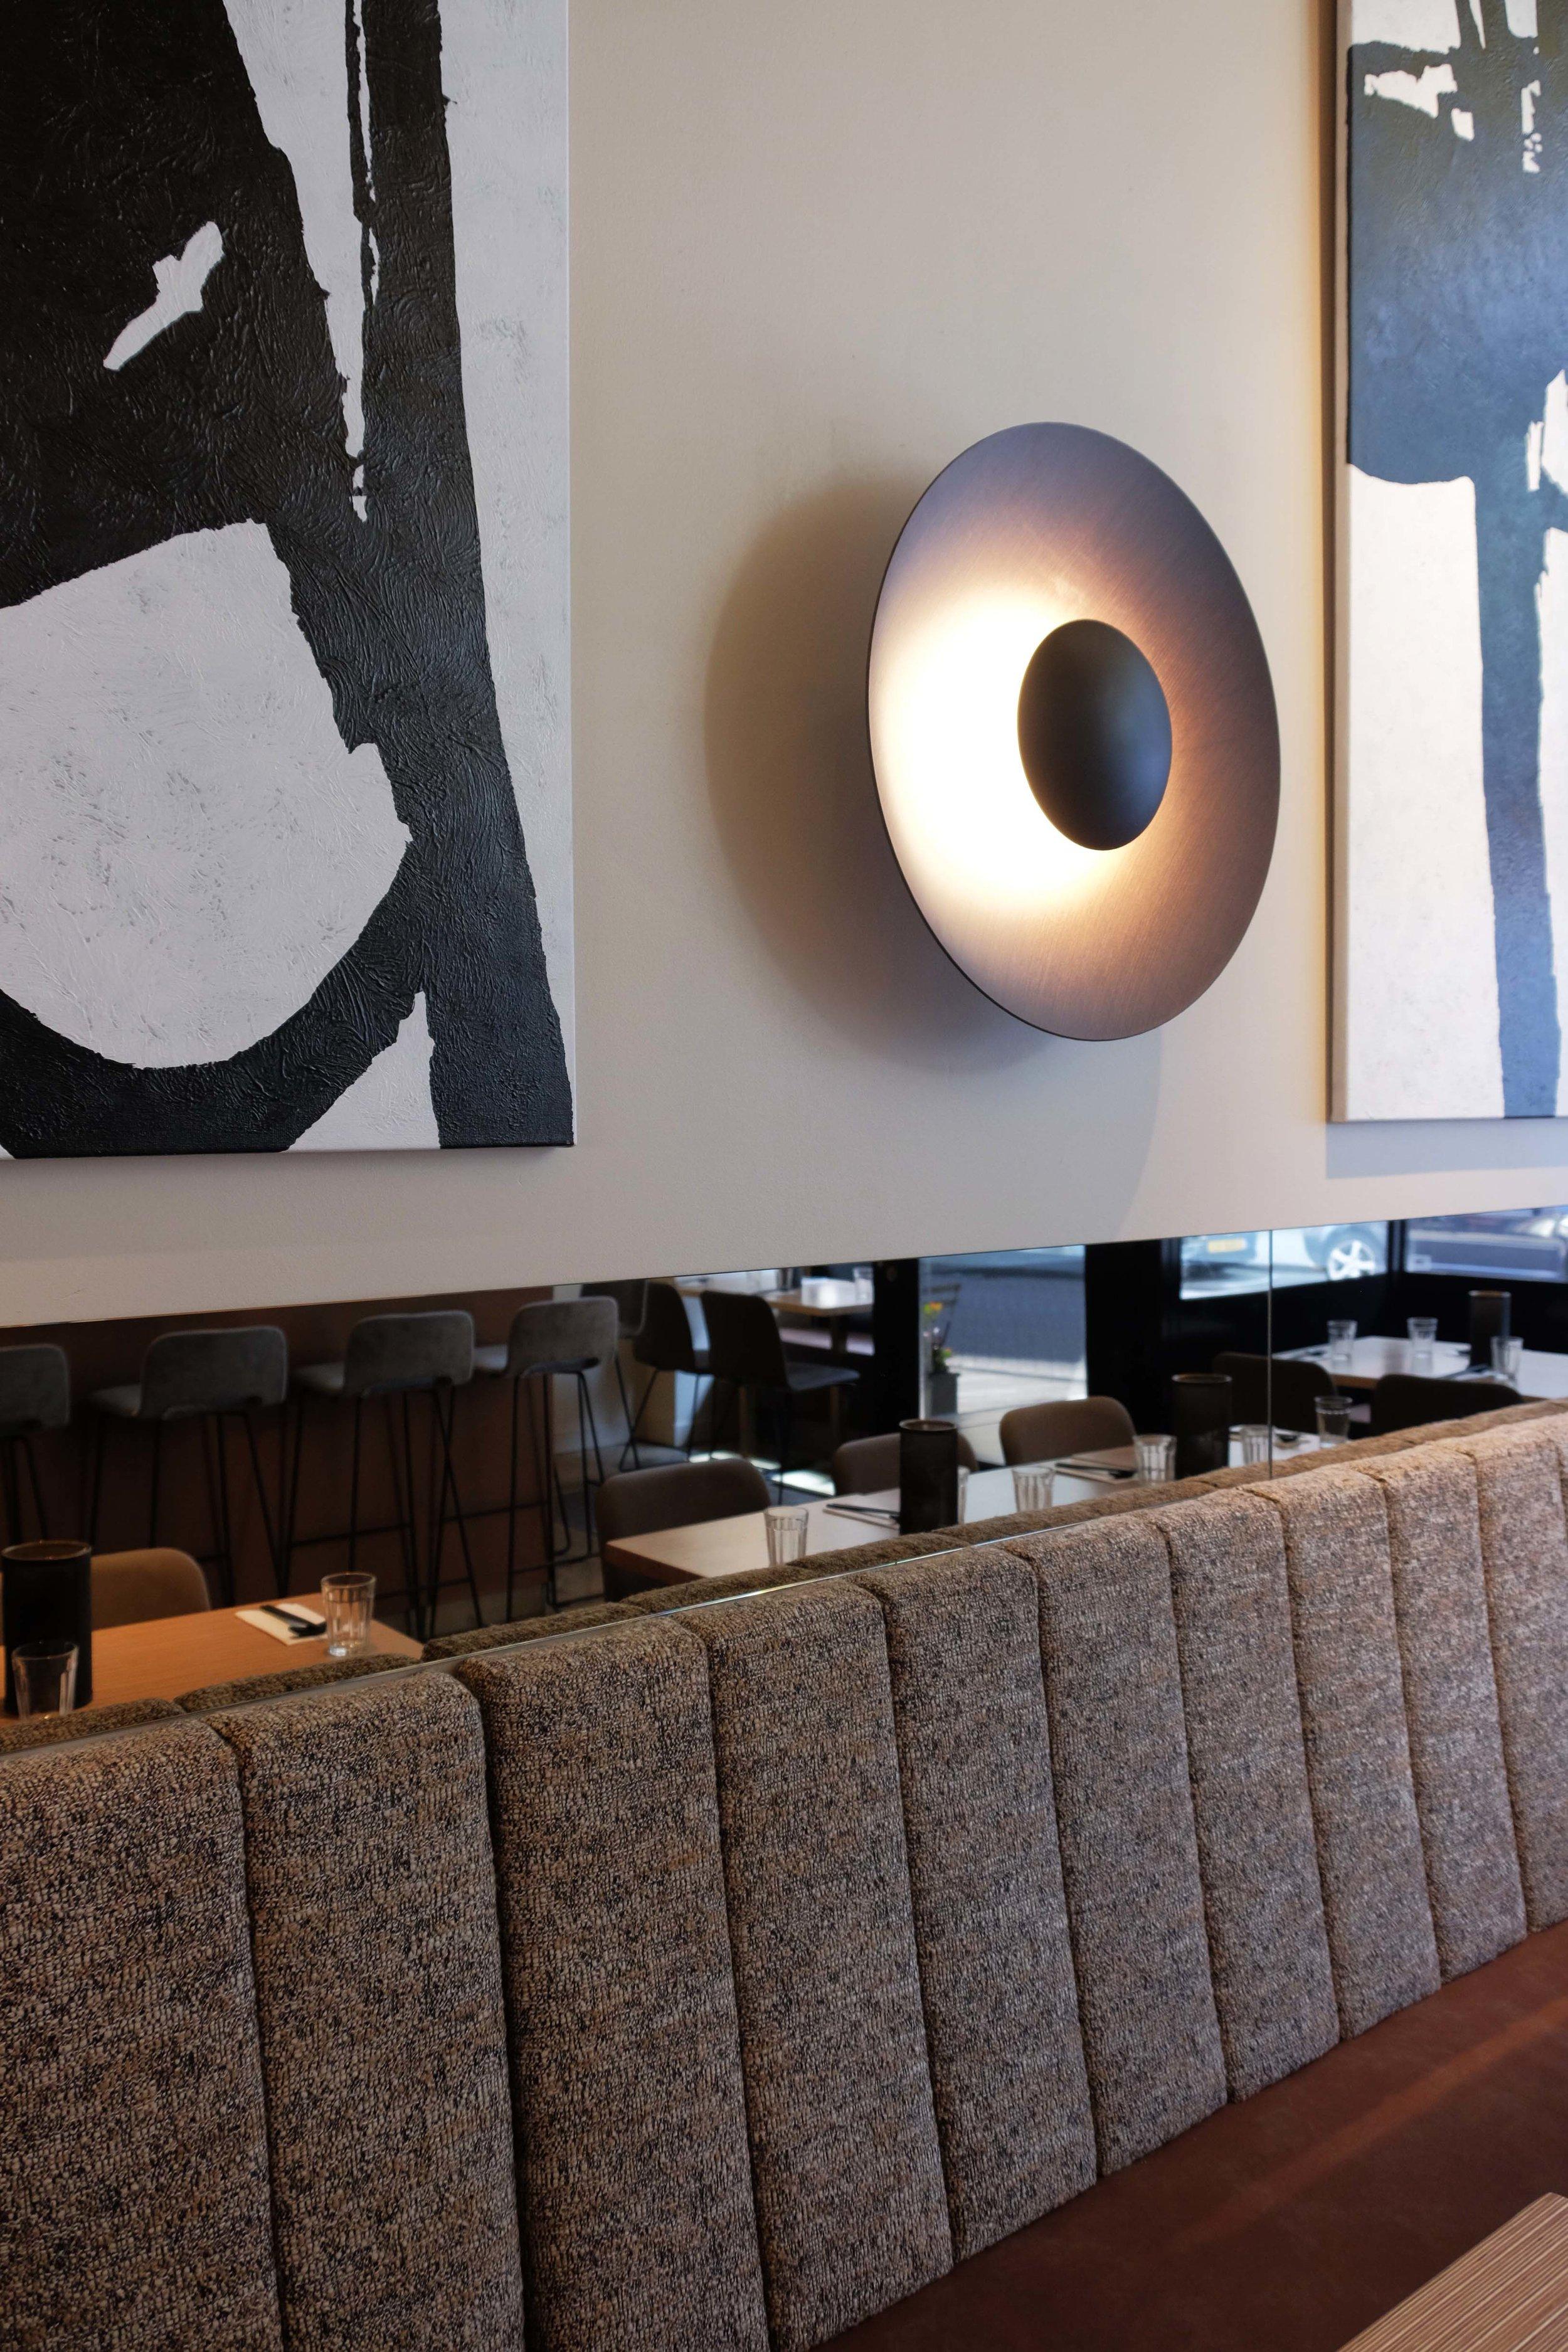 Restaurant Nooch Rotterdam westewagenstraat 56 lex de gooijer interiors 018.jpg